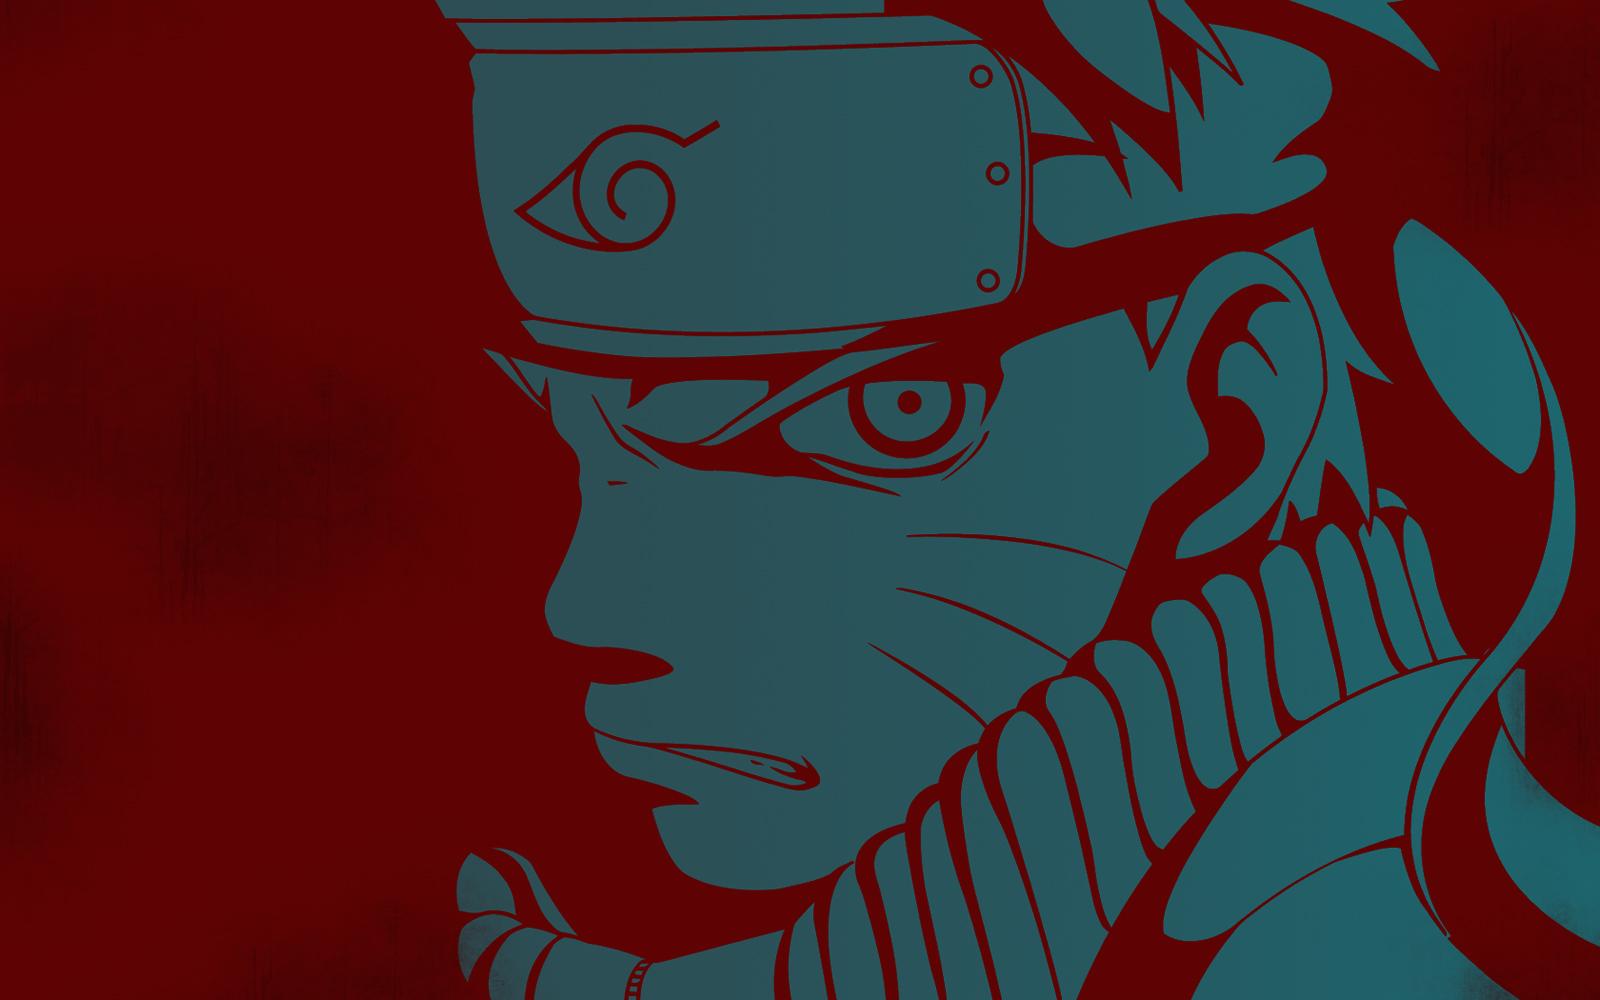 Naruto Uzumaki HD Anime Wallpapers Desktop Wallpapers 1600x1000